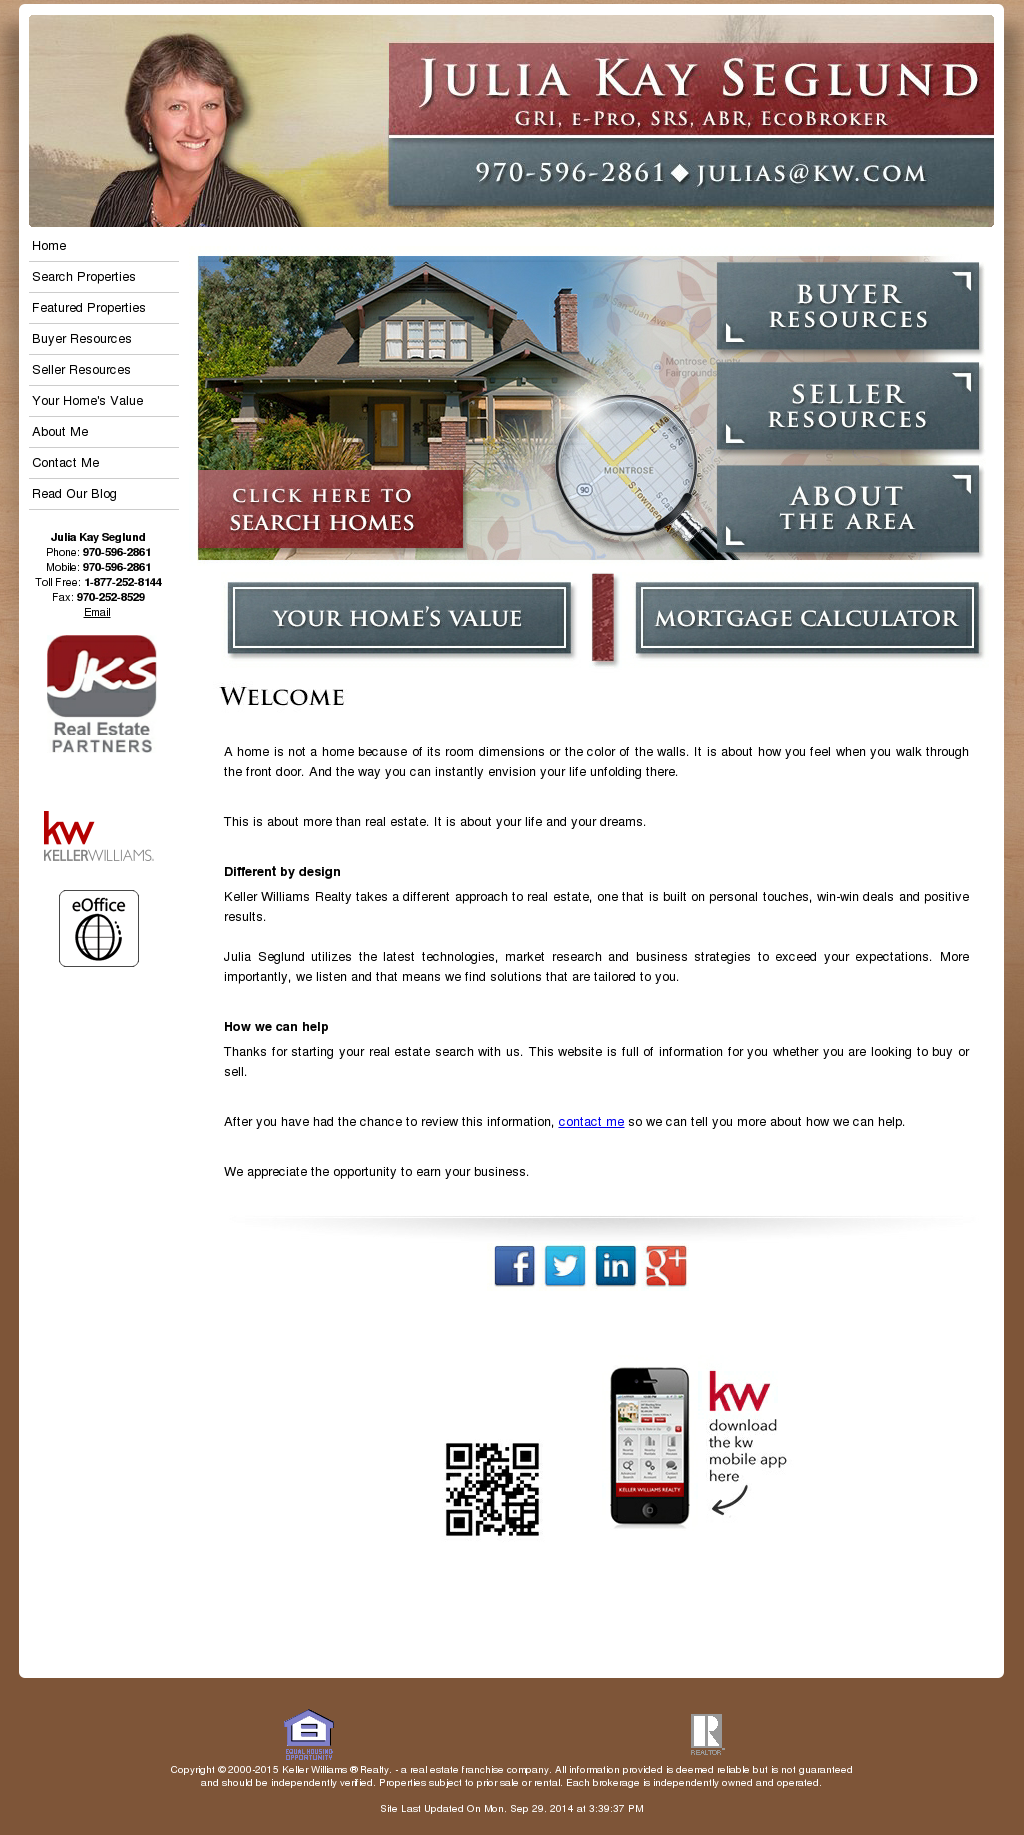 Jks Real Estate Partners At Keller Williams Colorado West